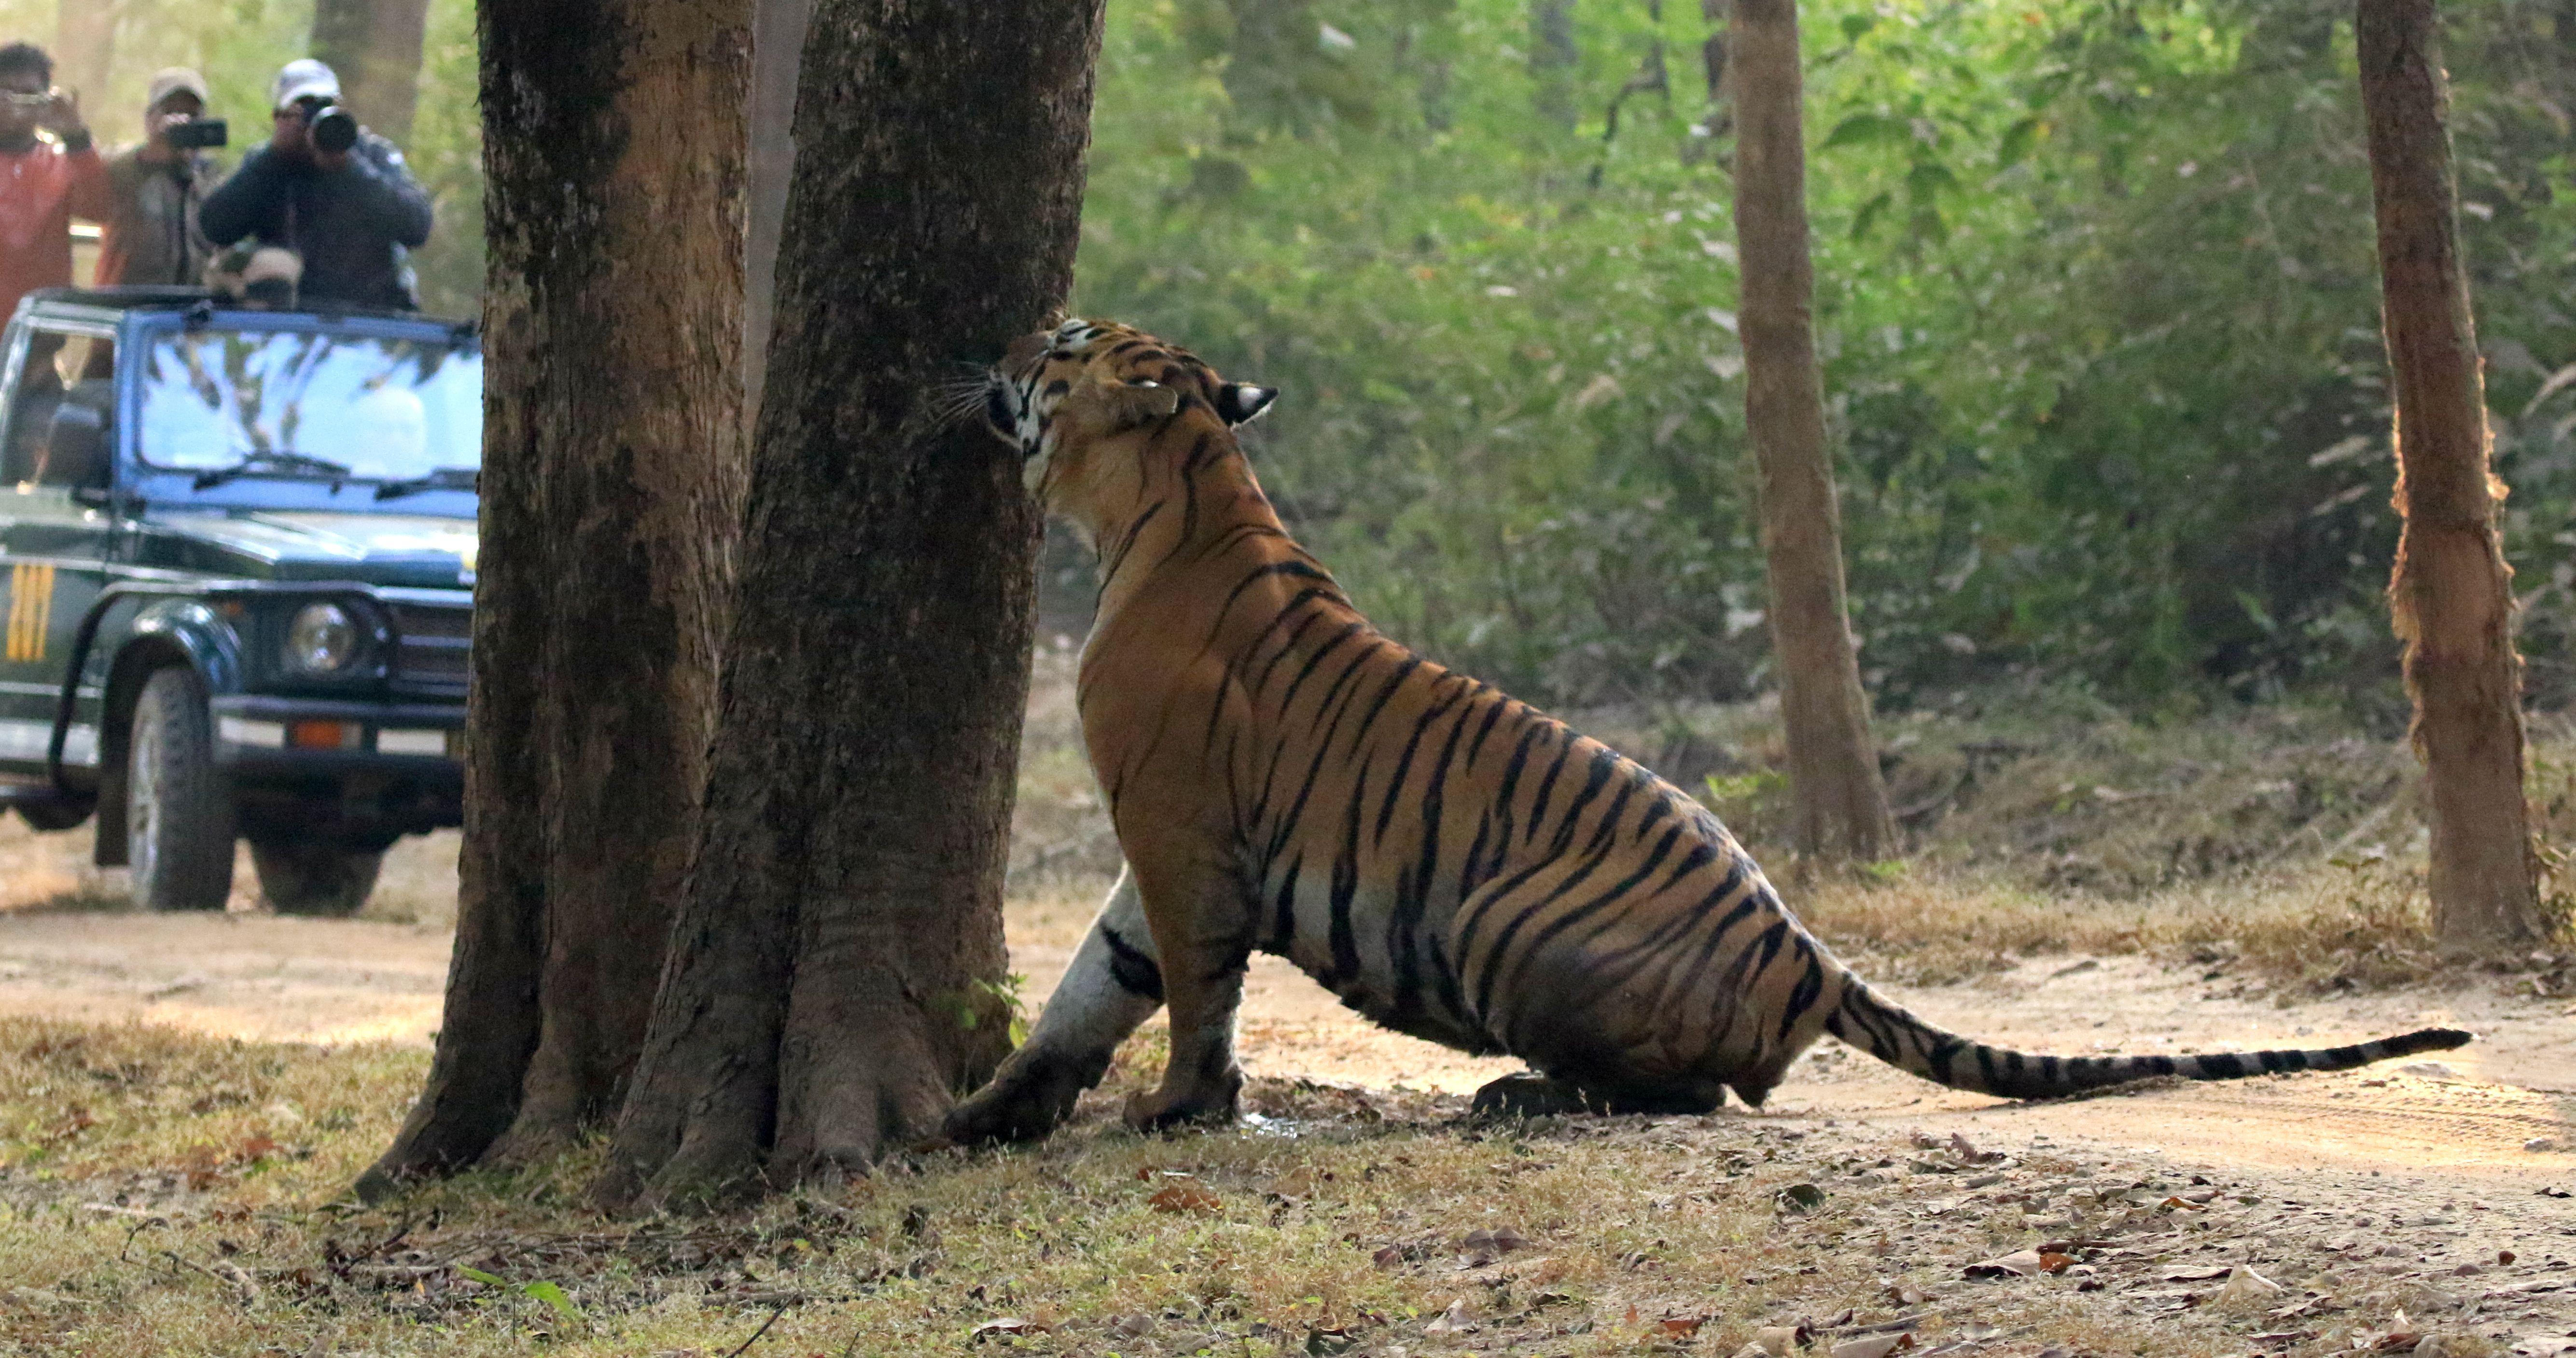 Tiger_Kanha National Park_7.jpg